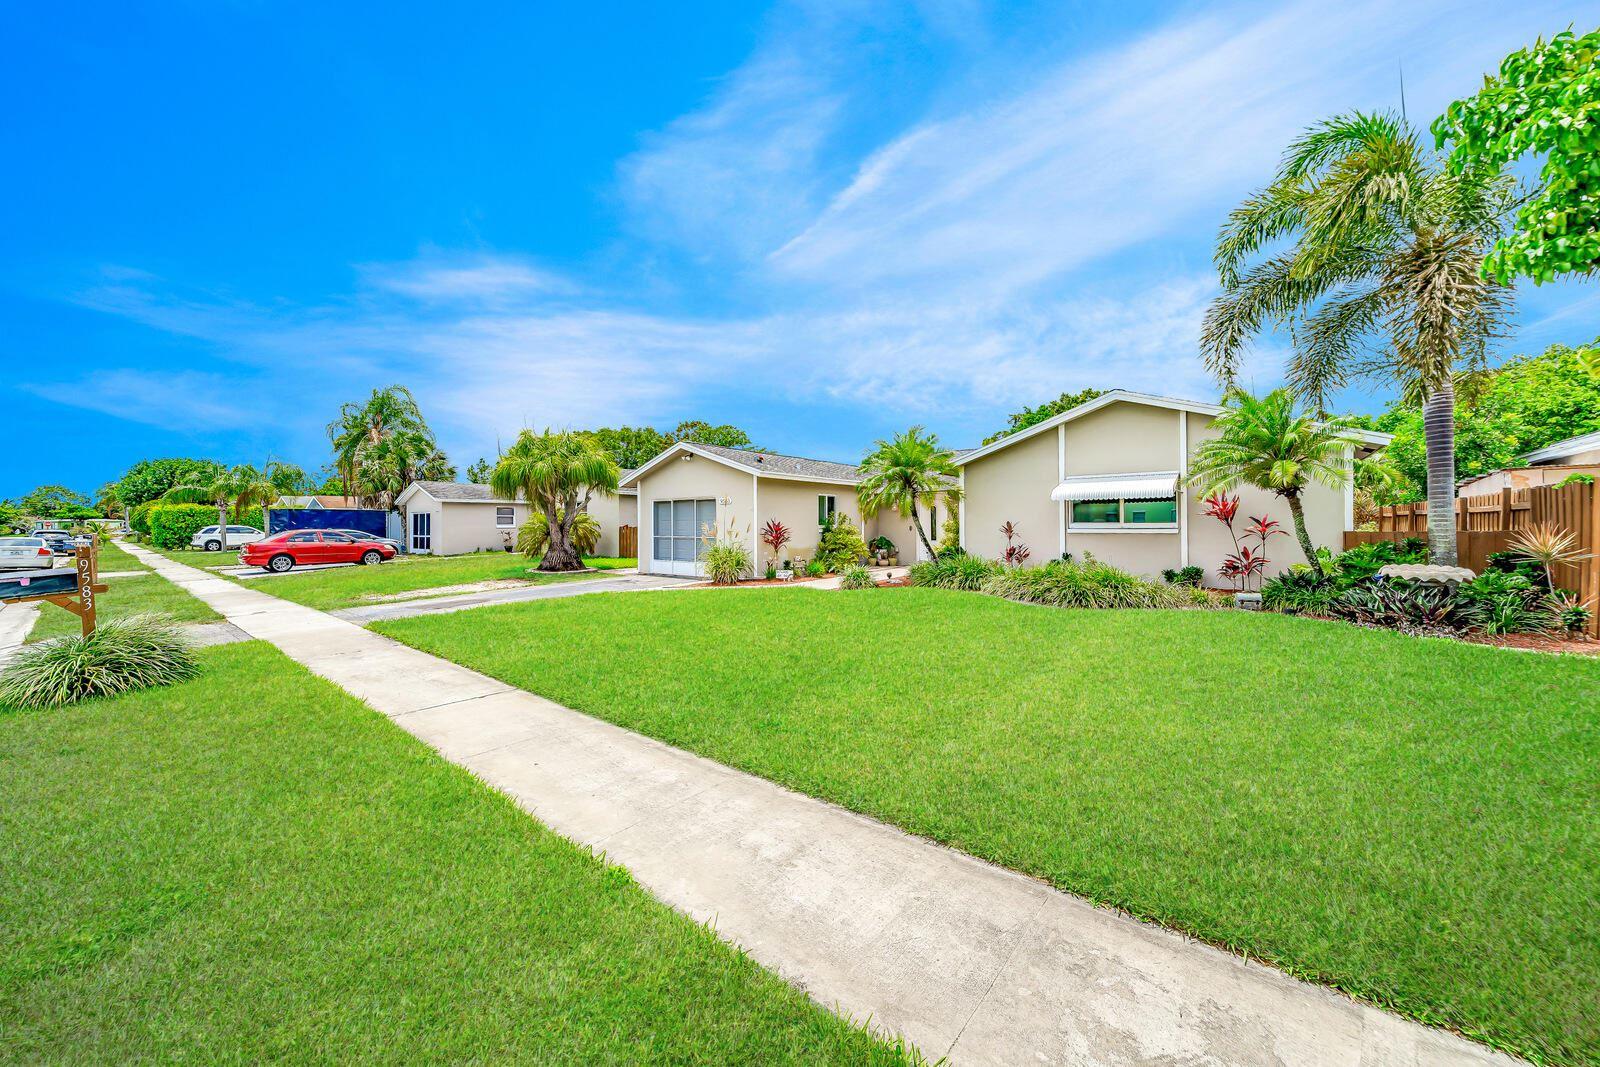 9583 SW 13th Place, Boca Raton, FL 33428 - MLS#: RX-10720395